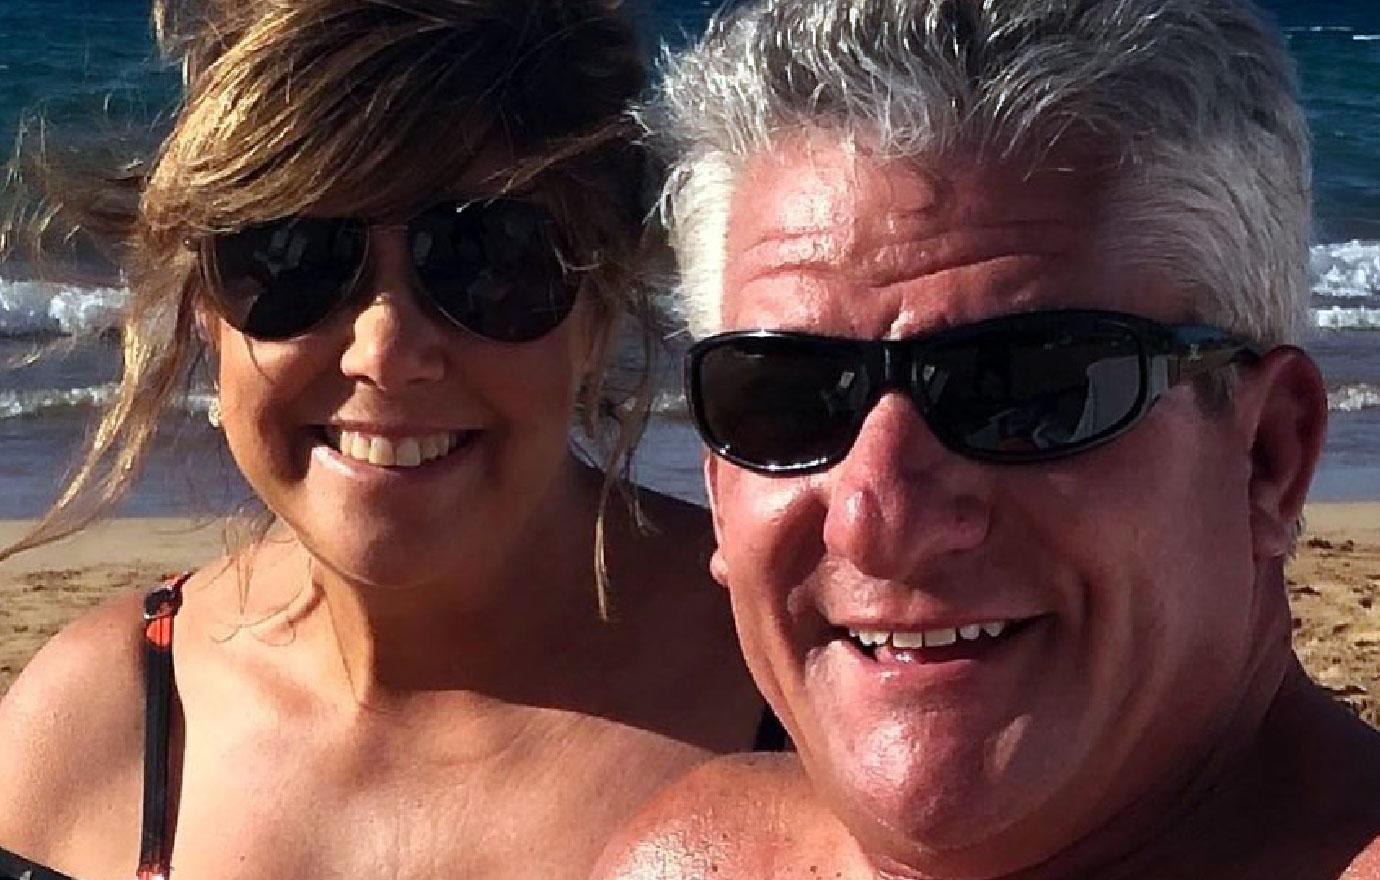 Matt Roloff And Caryn Chandler Return To Farm After Hawaii Vacation